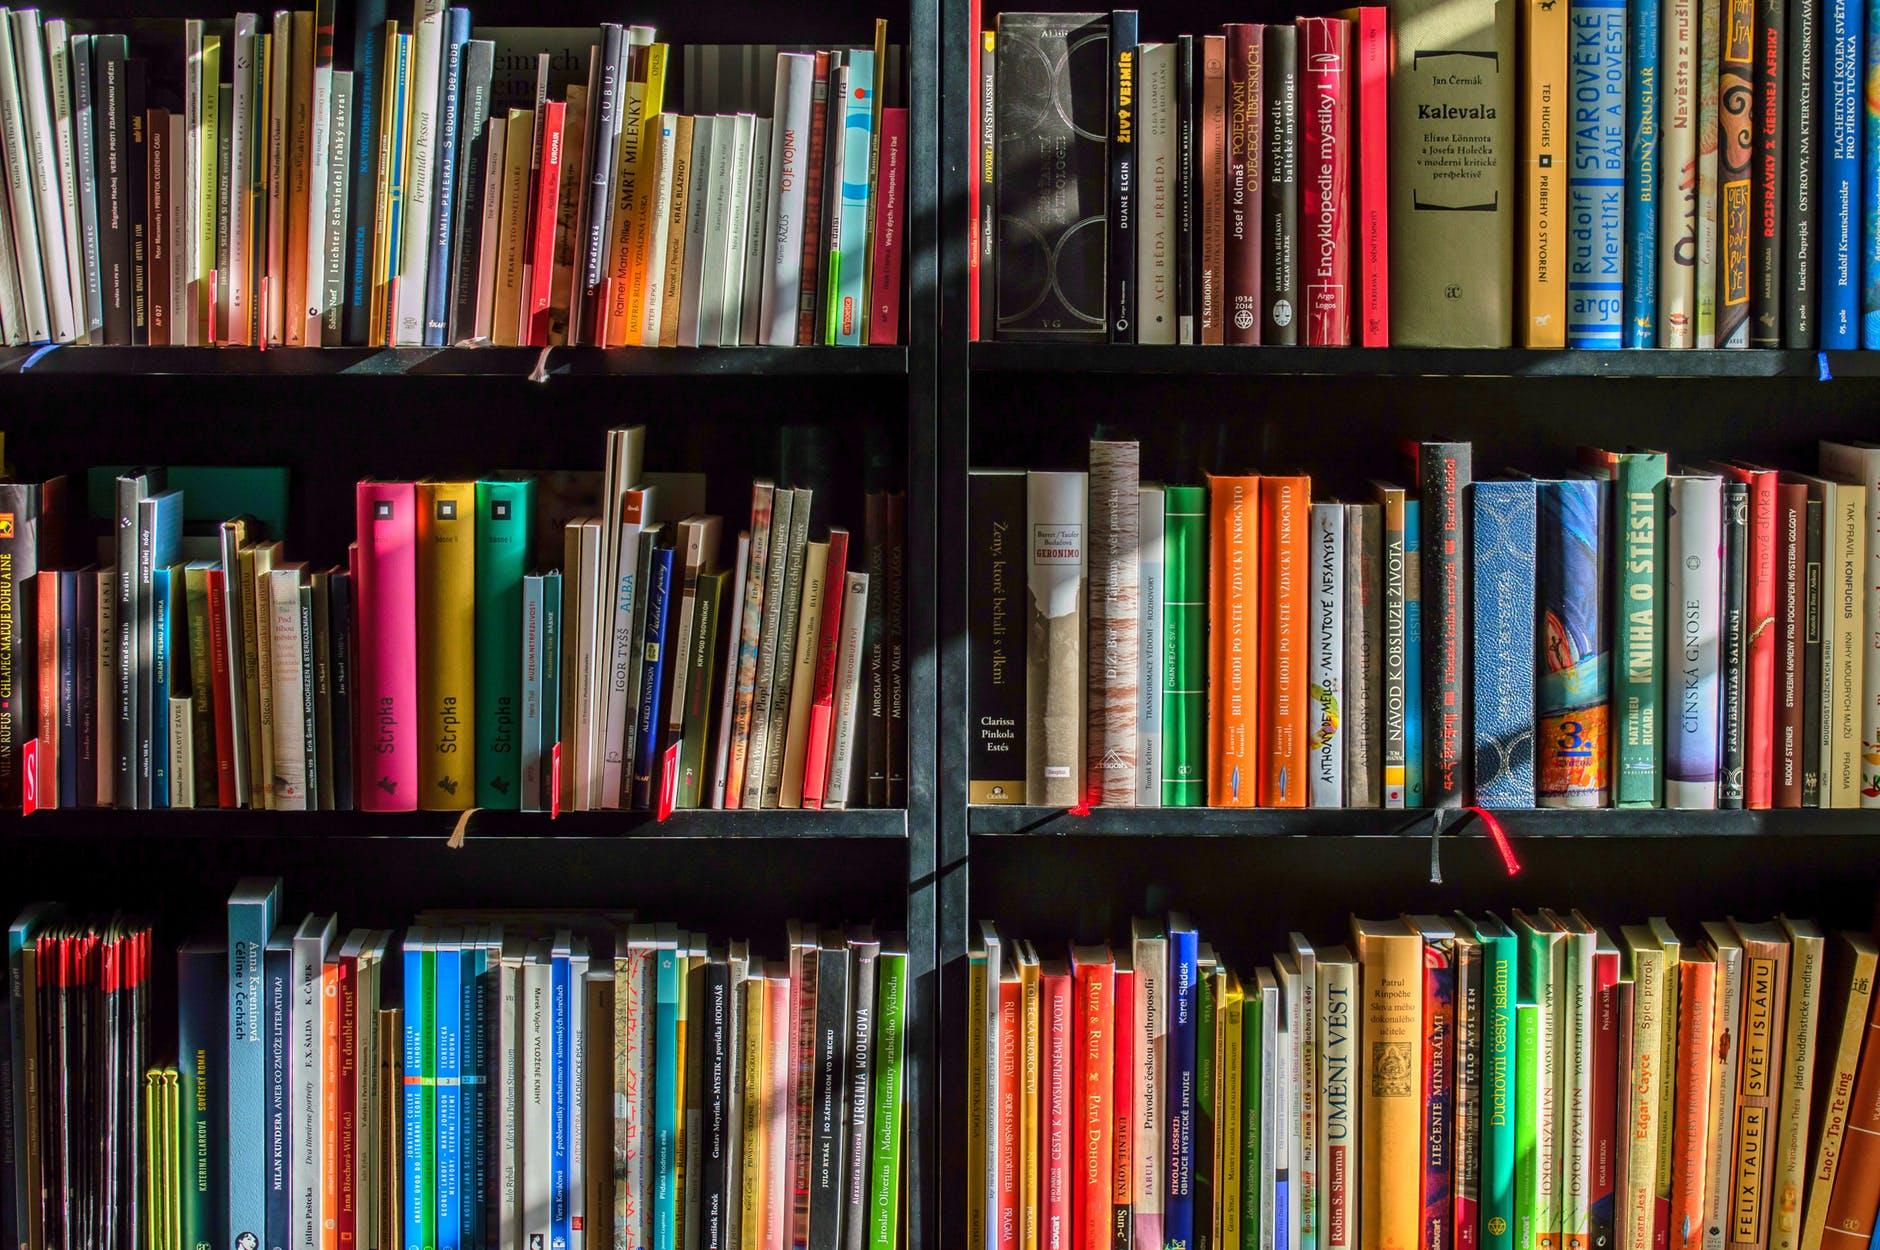 books-bookstore-book-reading-159711.jpeg